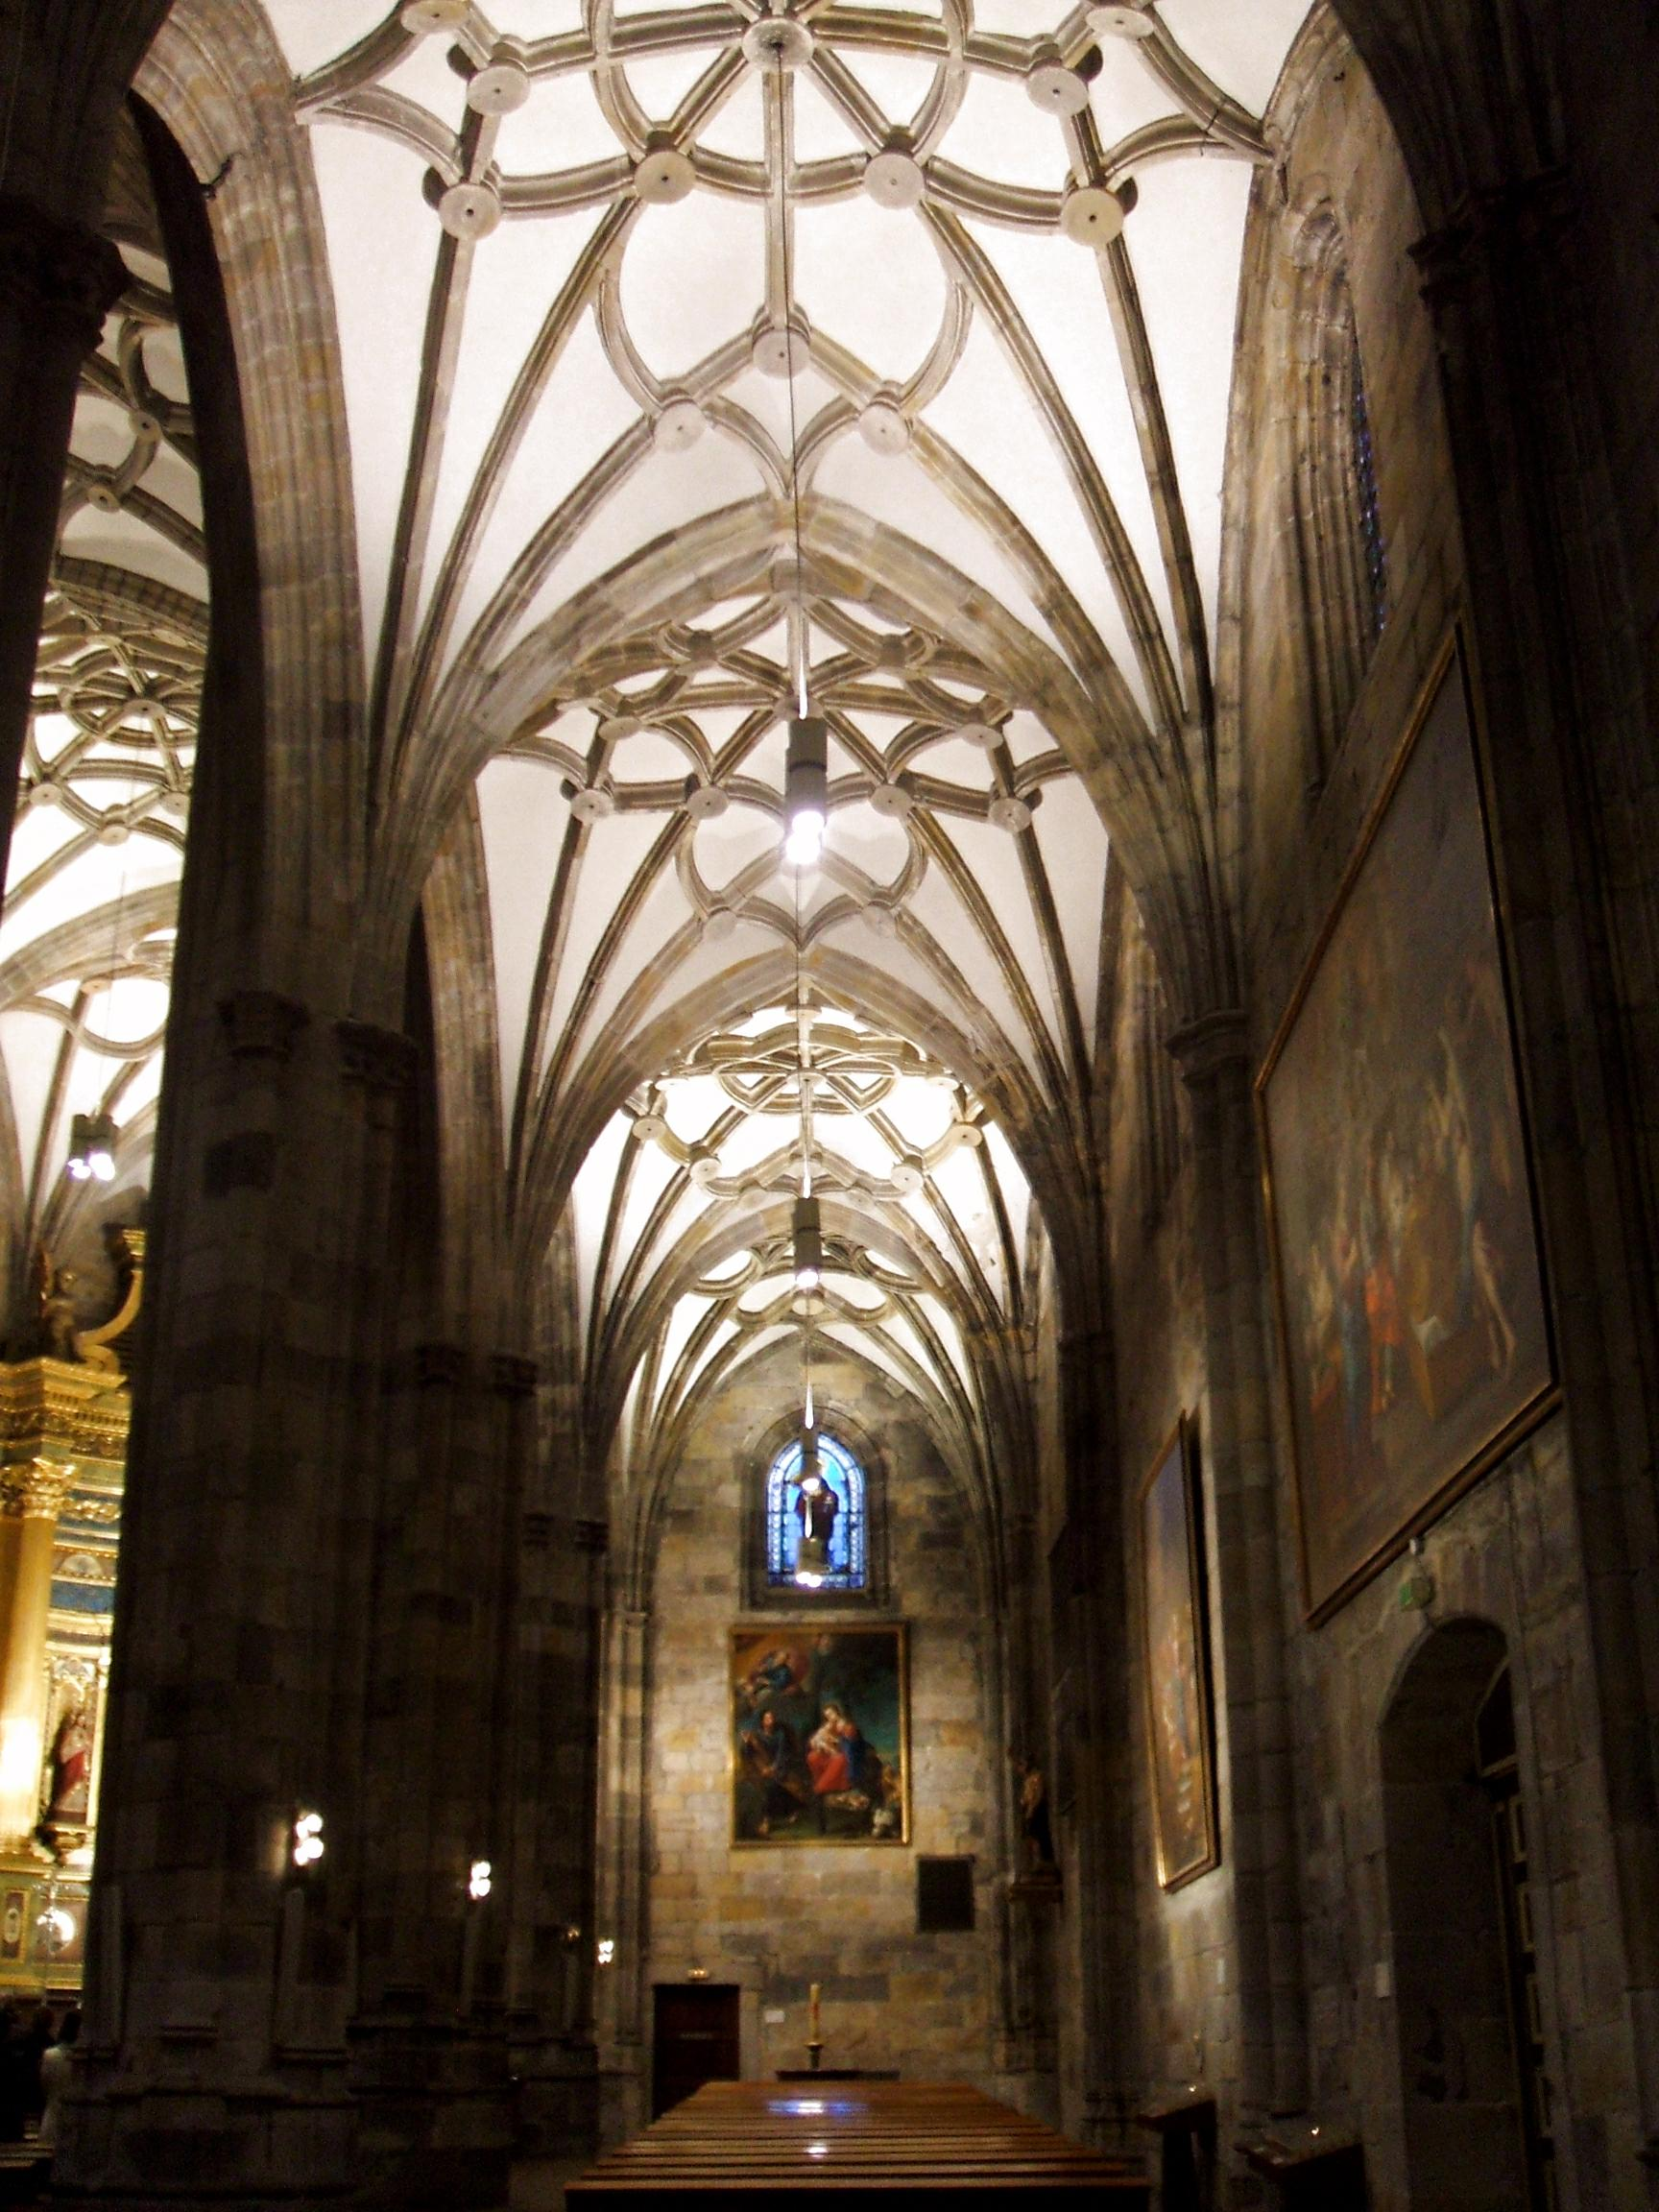 File:Bilbao - Basilica de Begoña 03.JPG - Wikimedia Commons